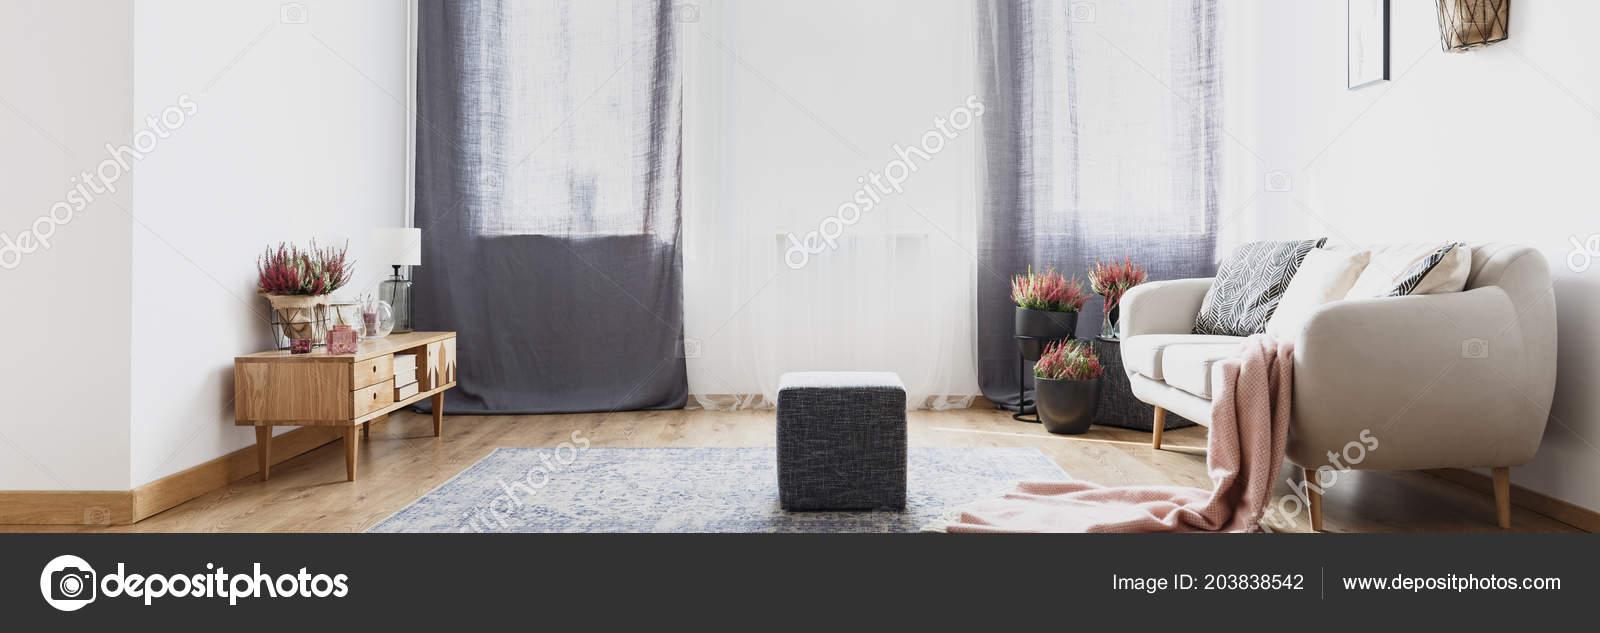 Grey Drapes Bright Living Room Interior Pouf Carpet Beige Sofa Stock Photo C Photographee Eu 203838542